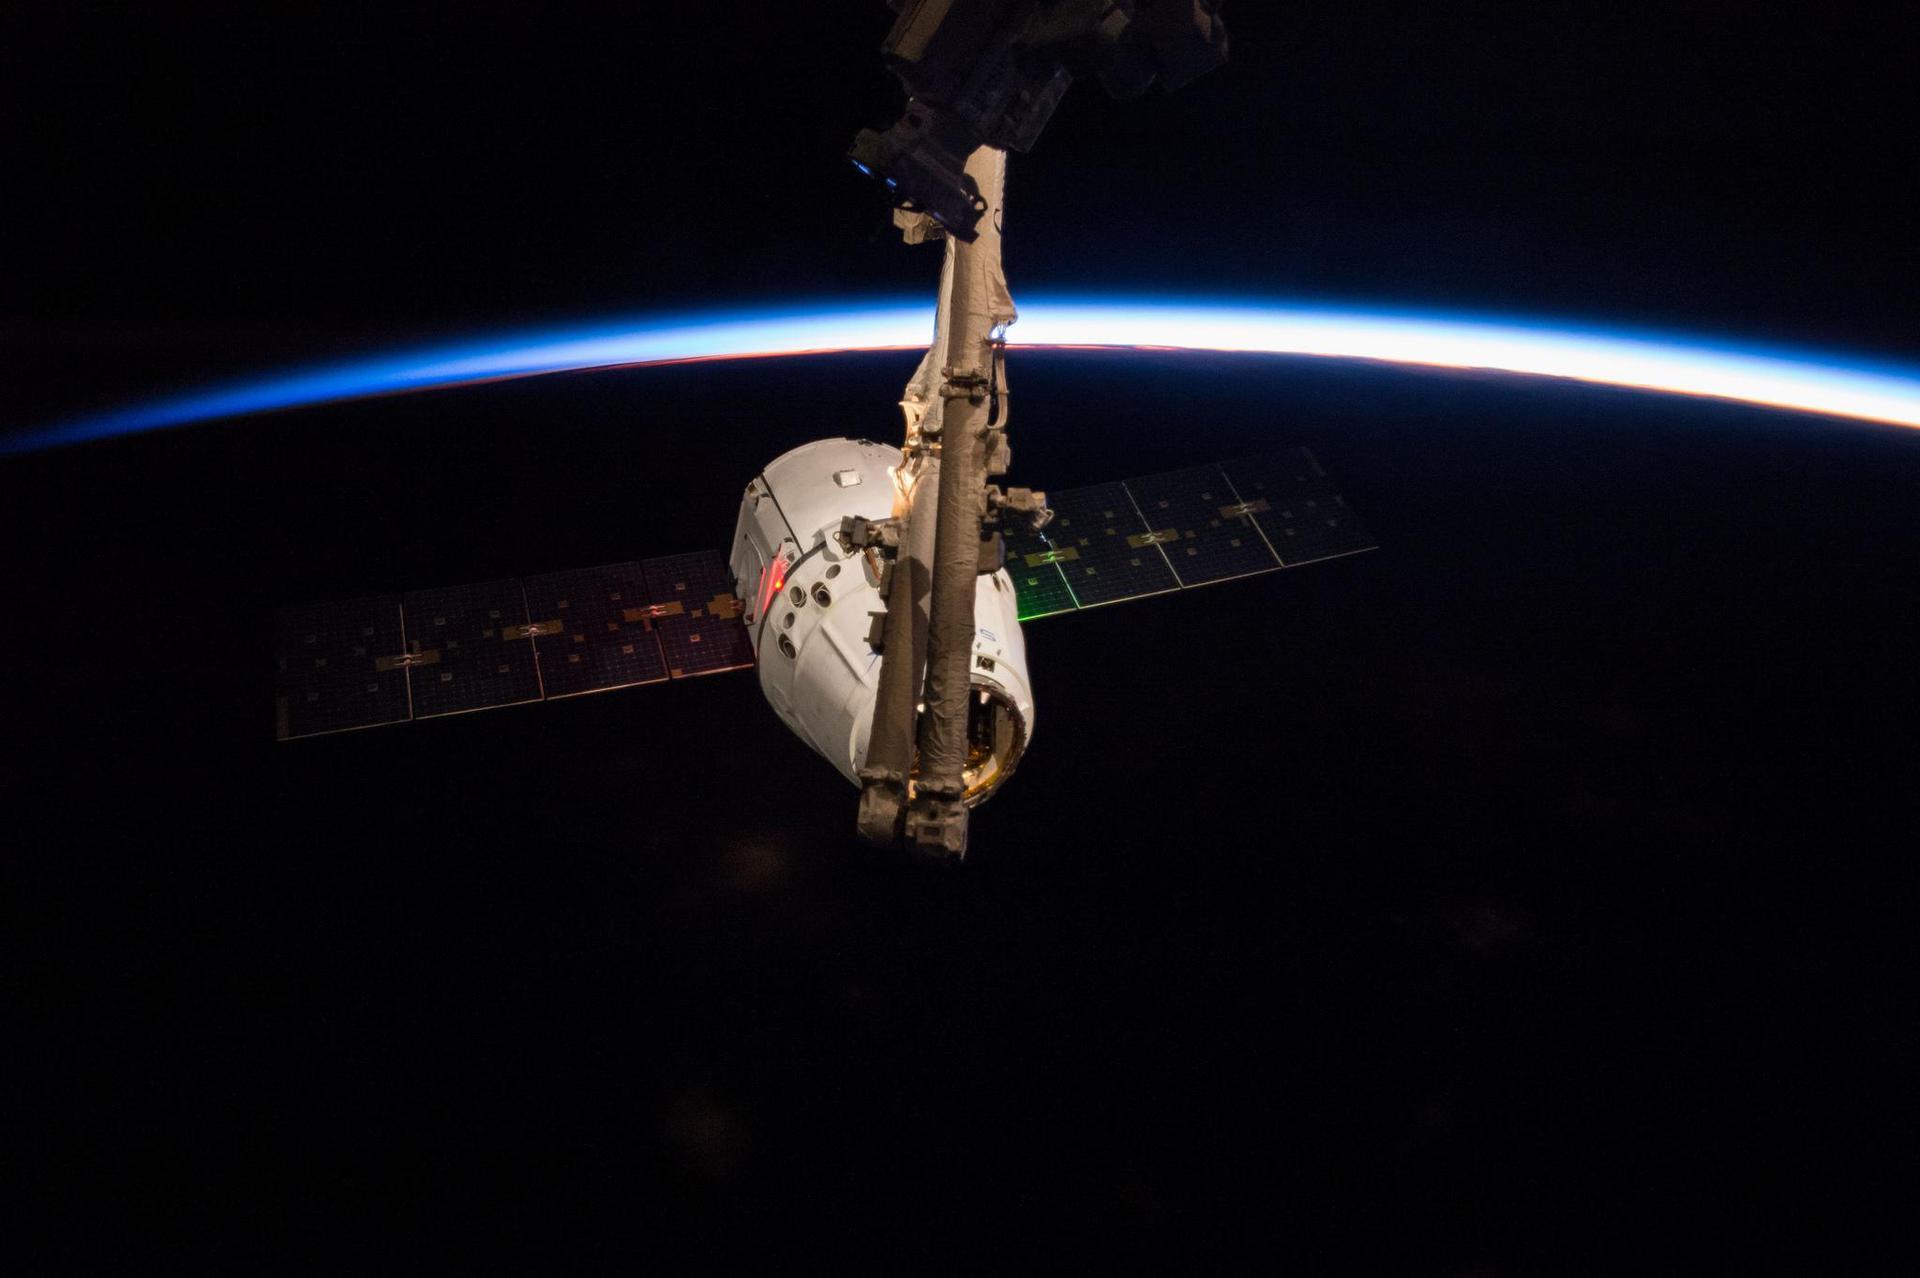 SpaceX вновь отложила запуск Falcon 9 - 2